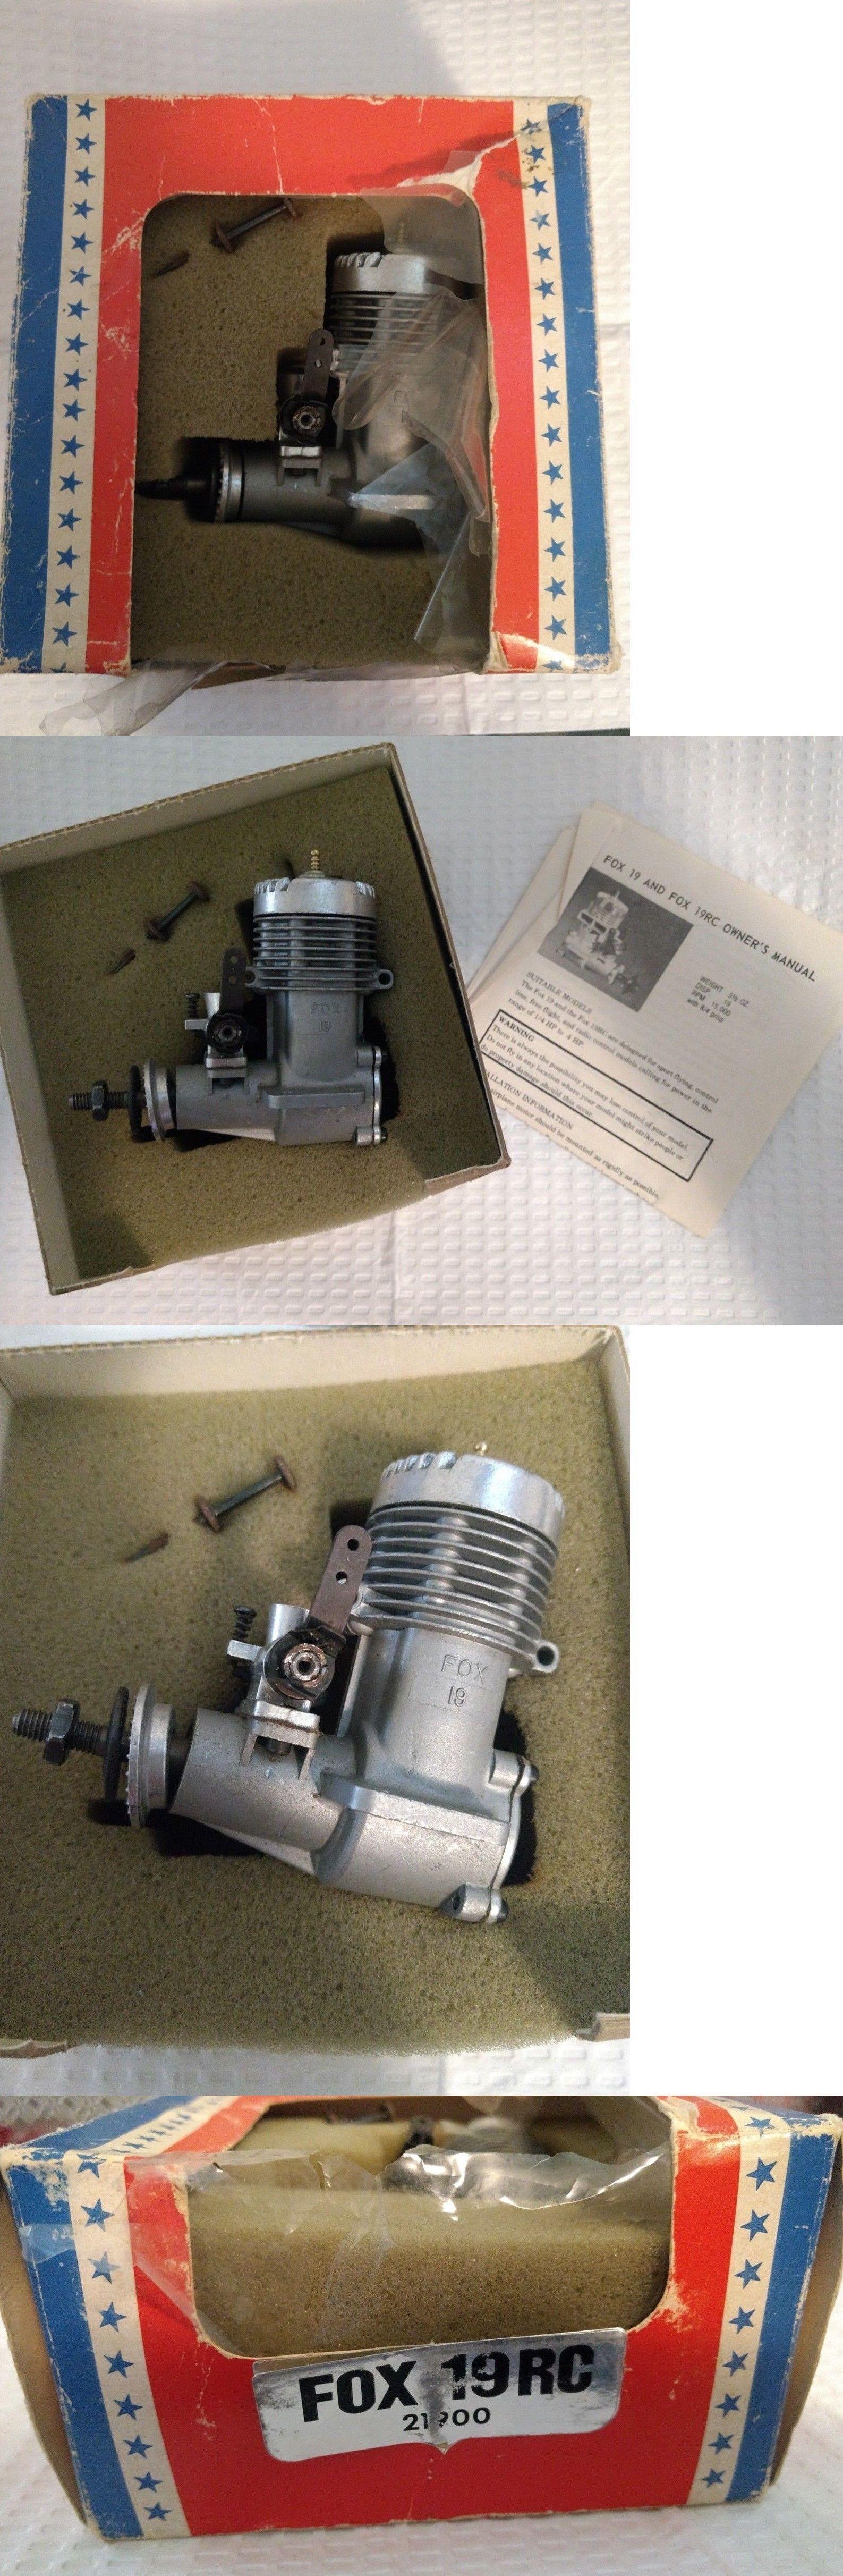 Gas Nitro Engines 182189: Fox 19 Rc Model Airplane Engine